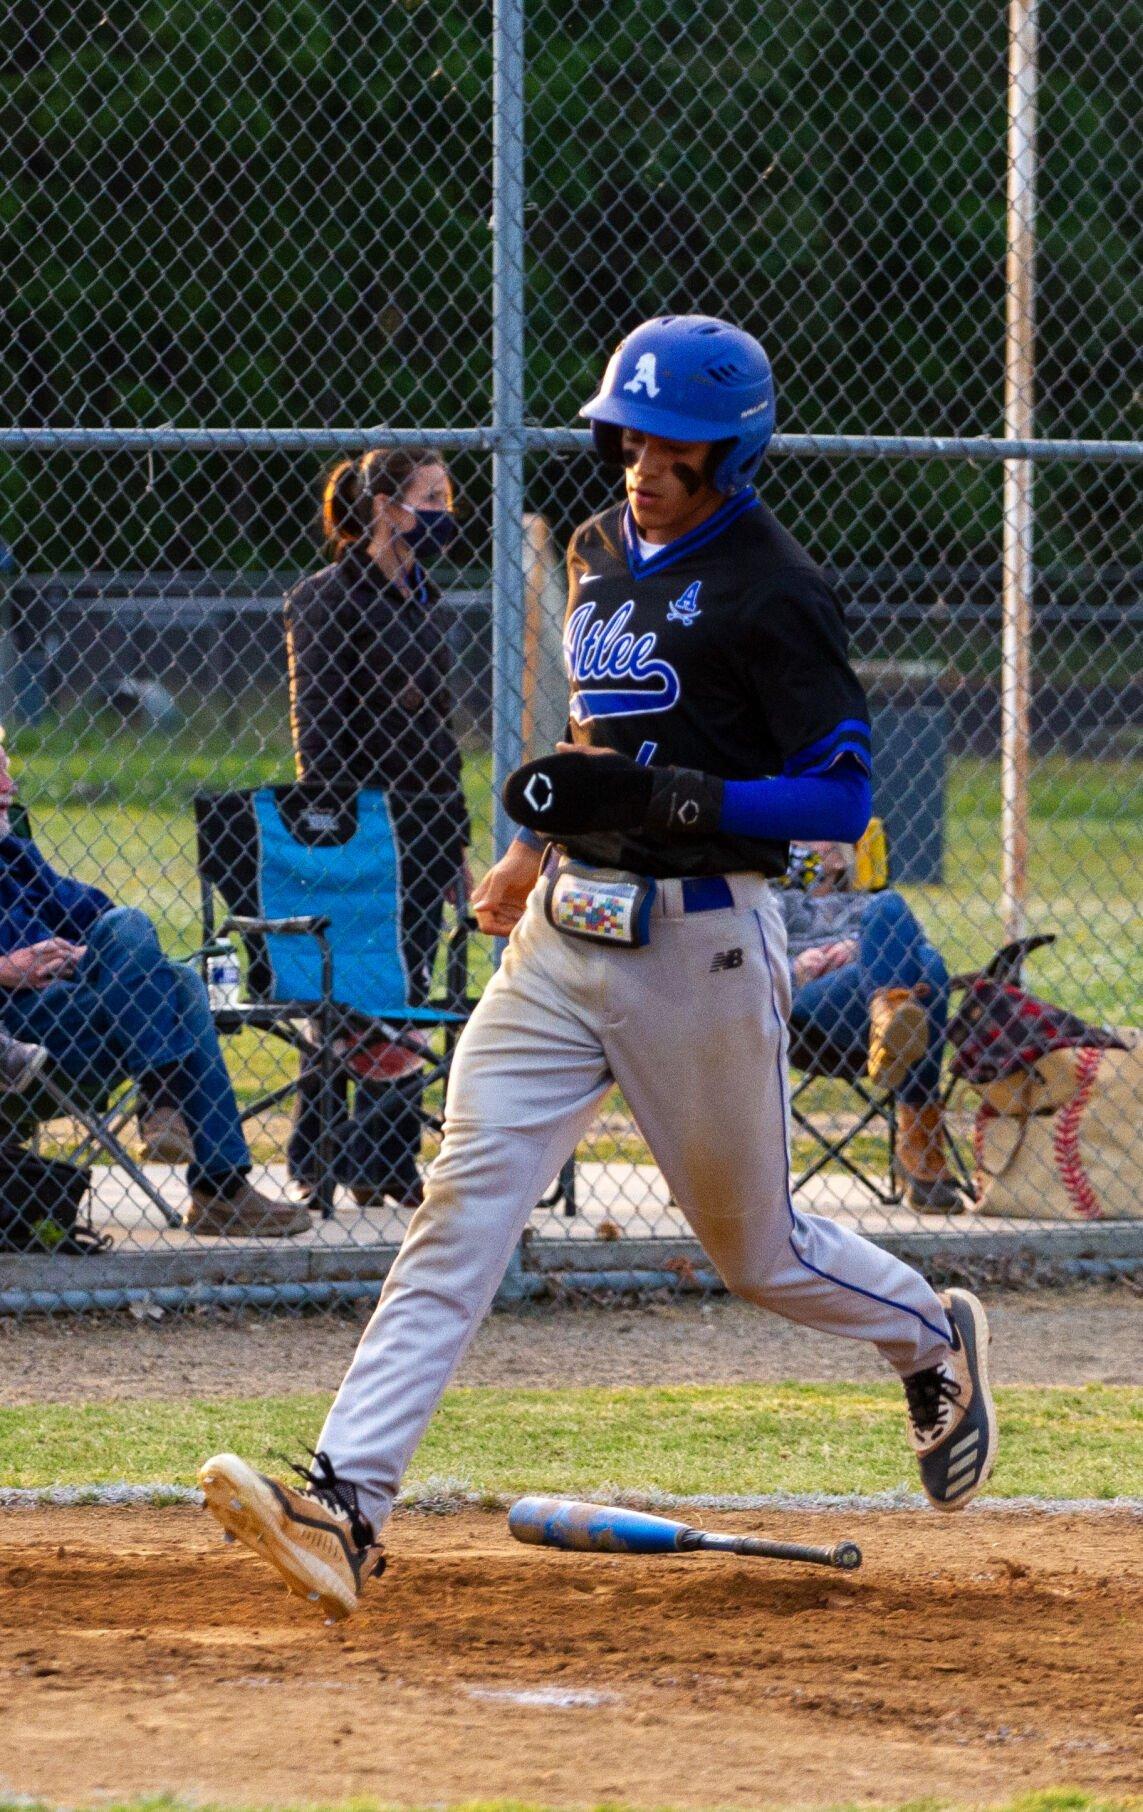 Atlee at Patrick Henry baseball: Montoya scores